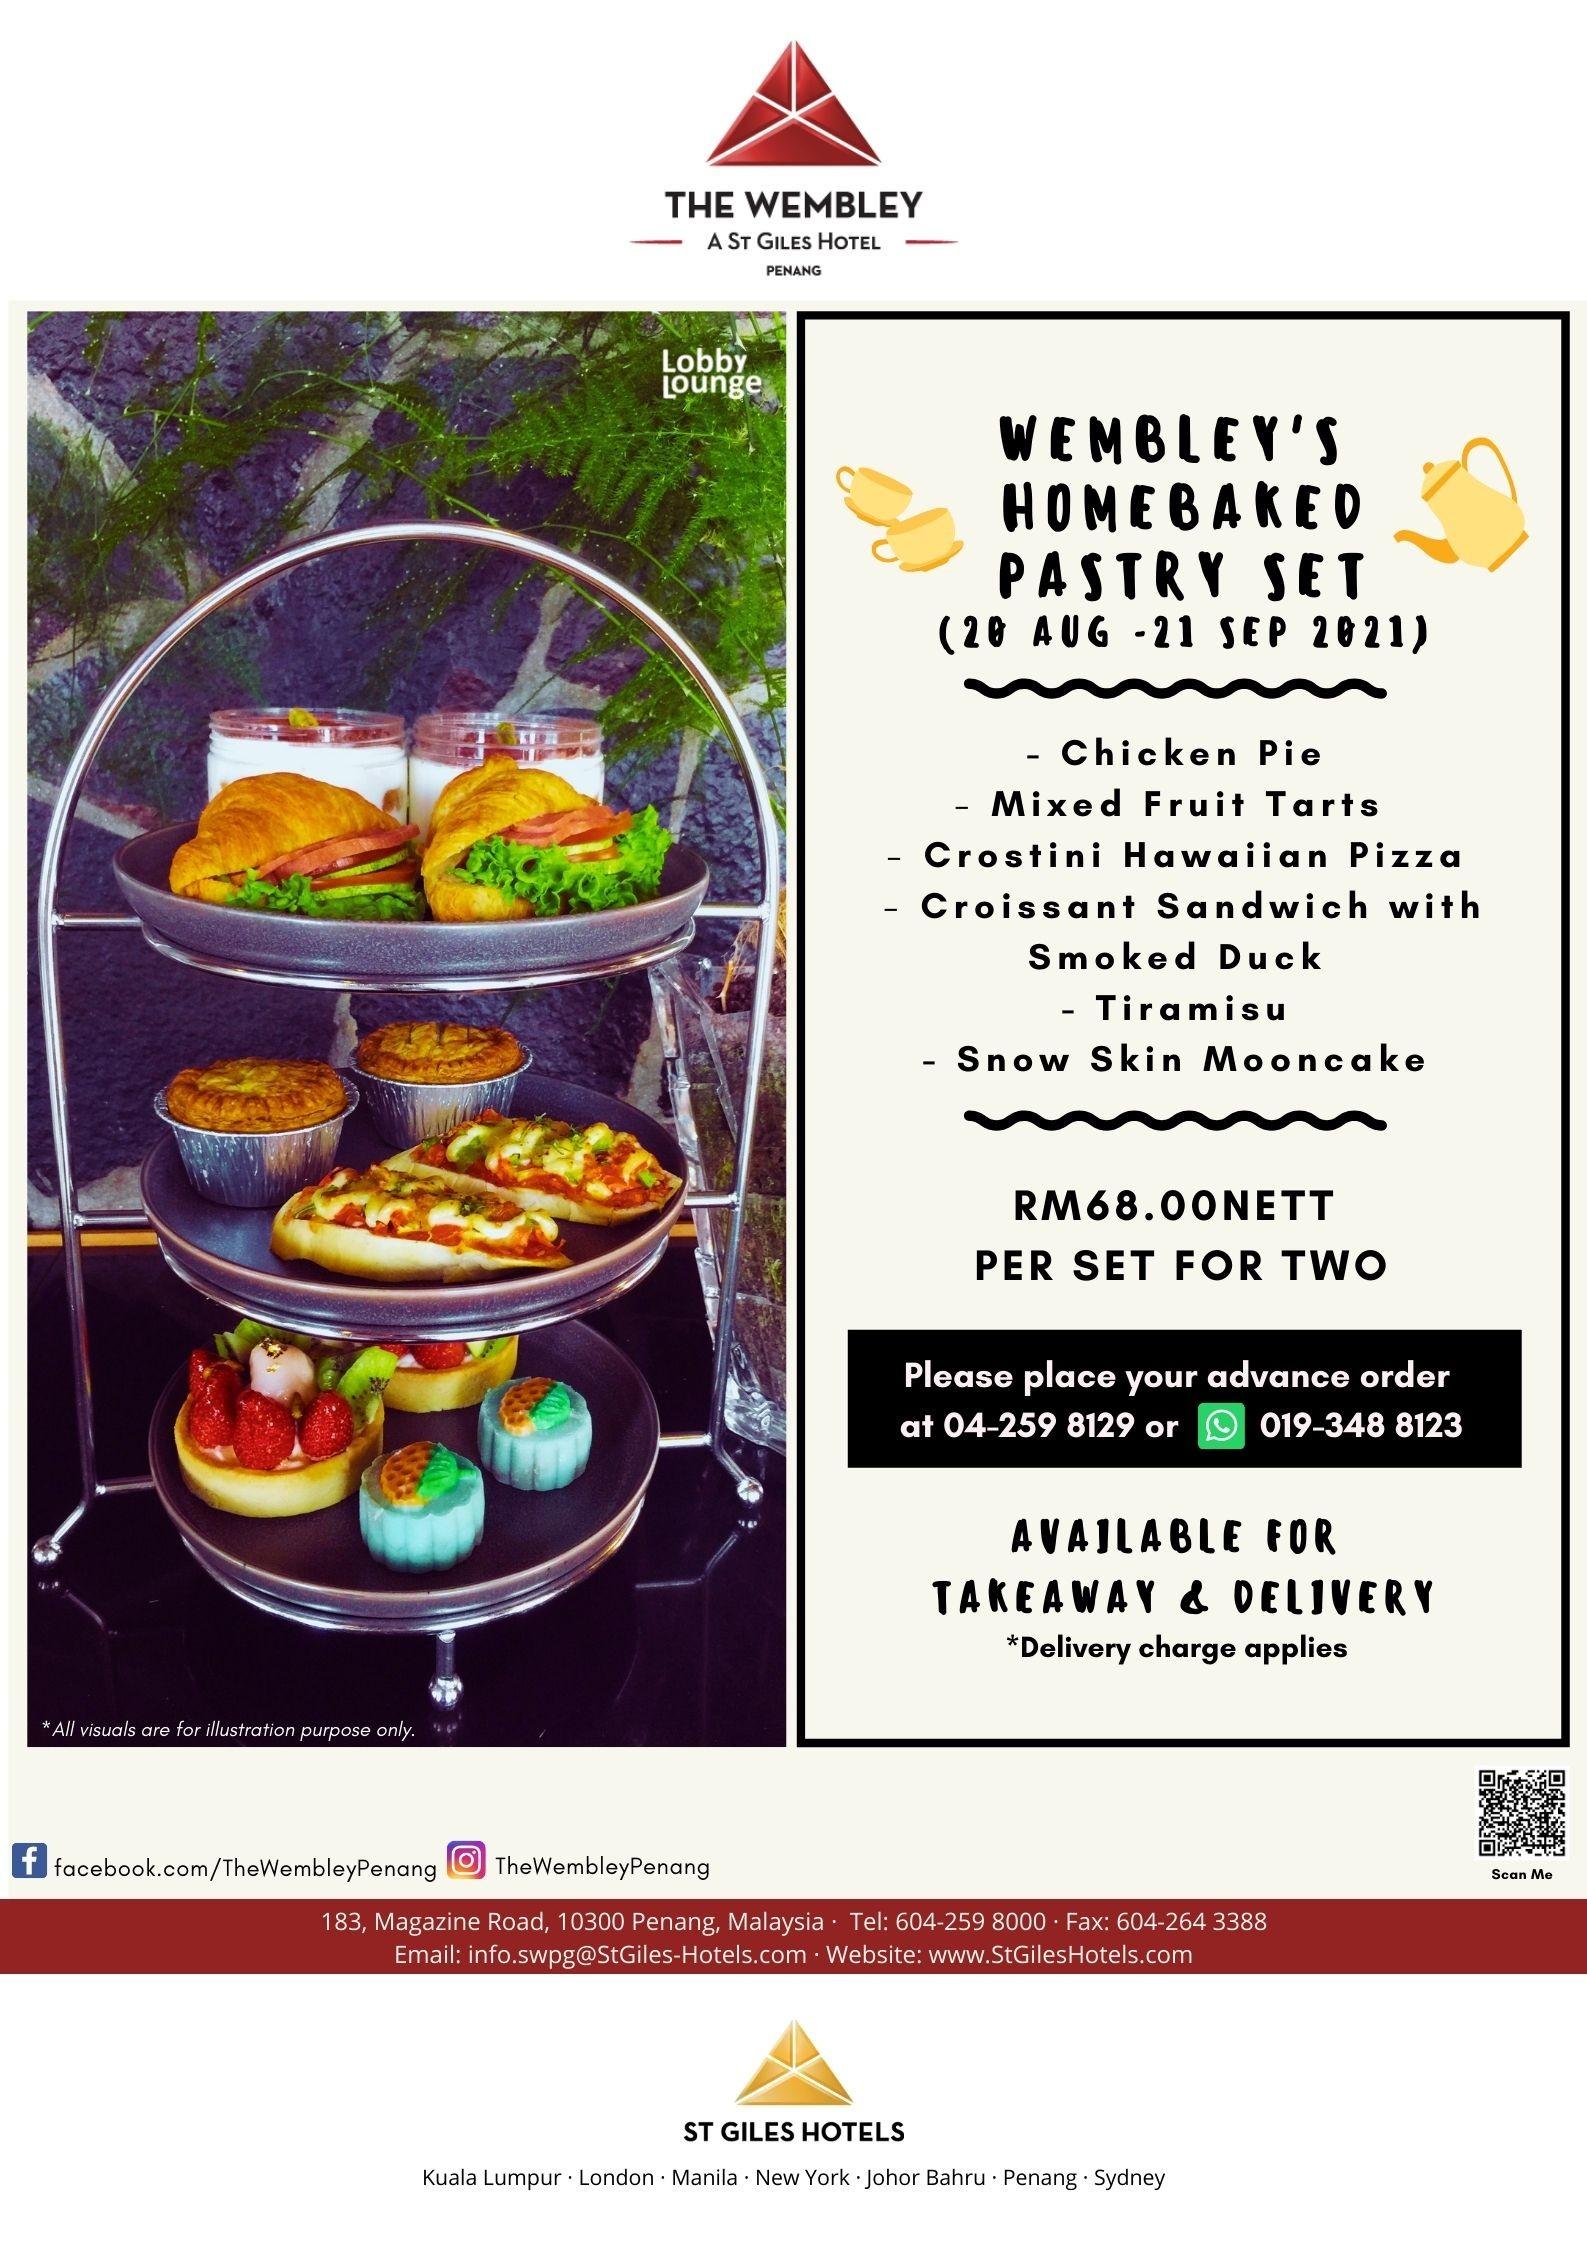 Wembley's Homebaked Pastry Set